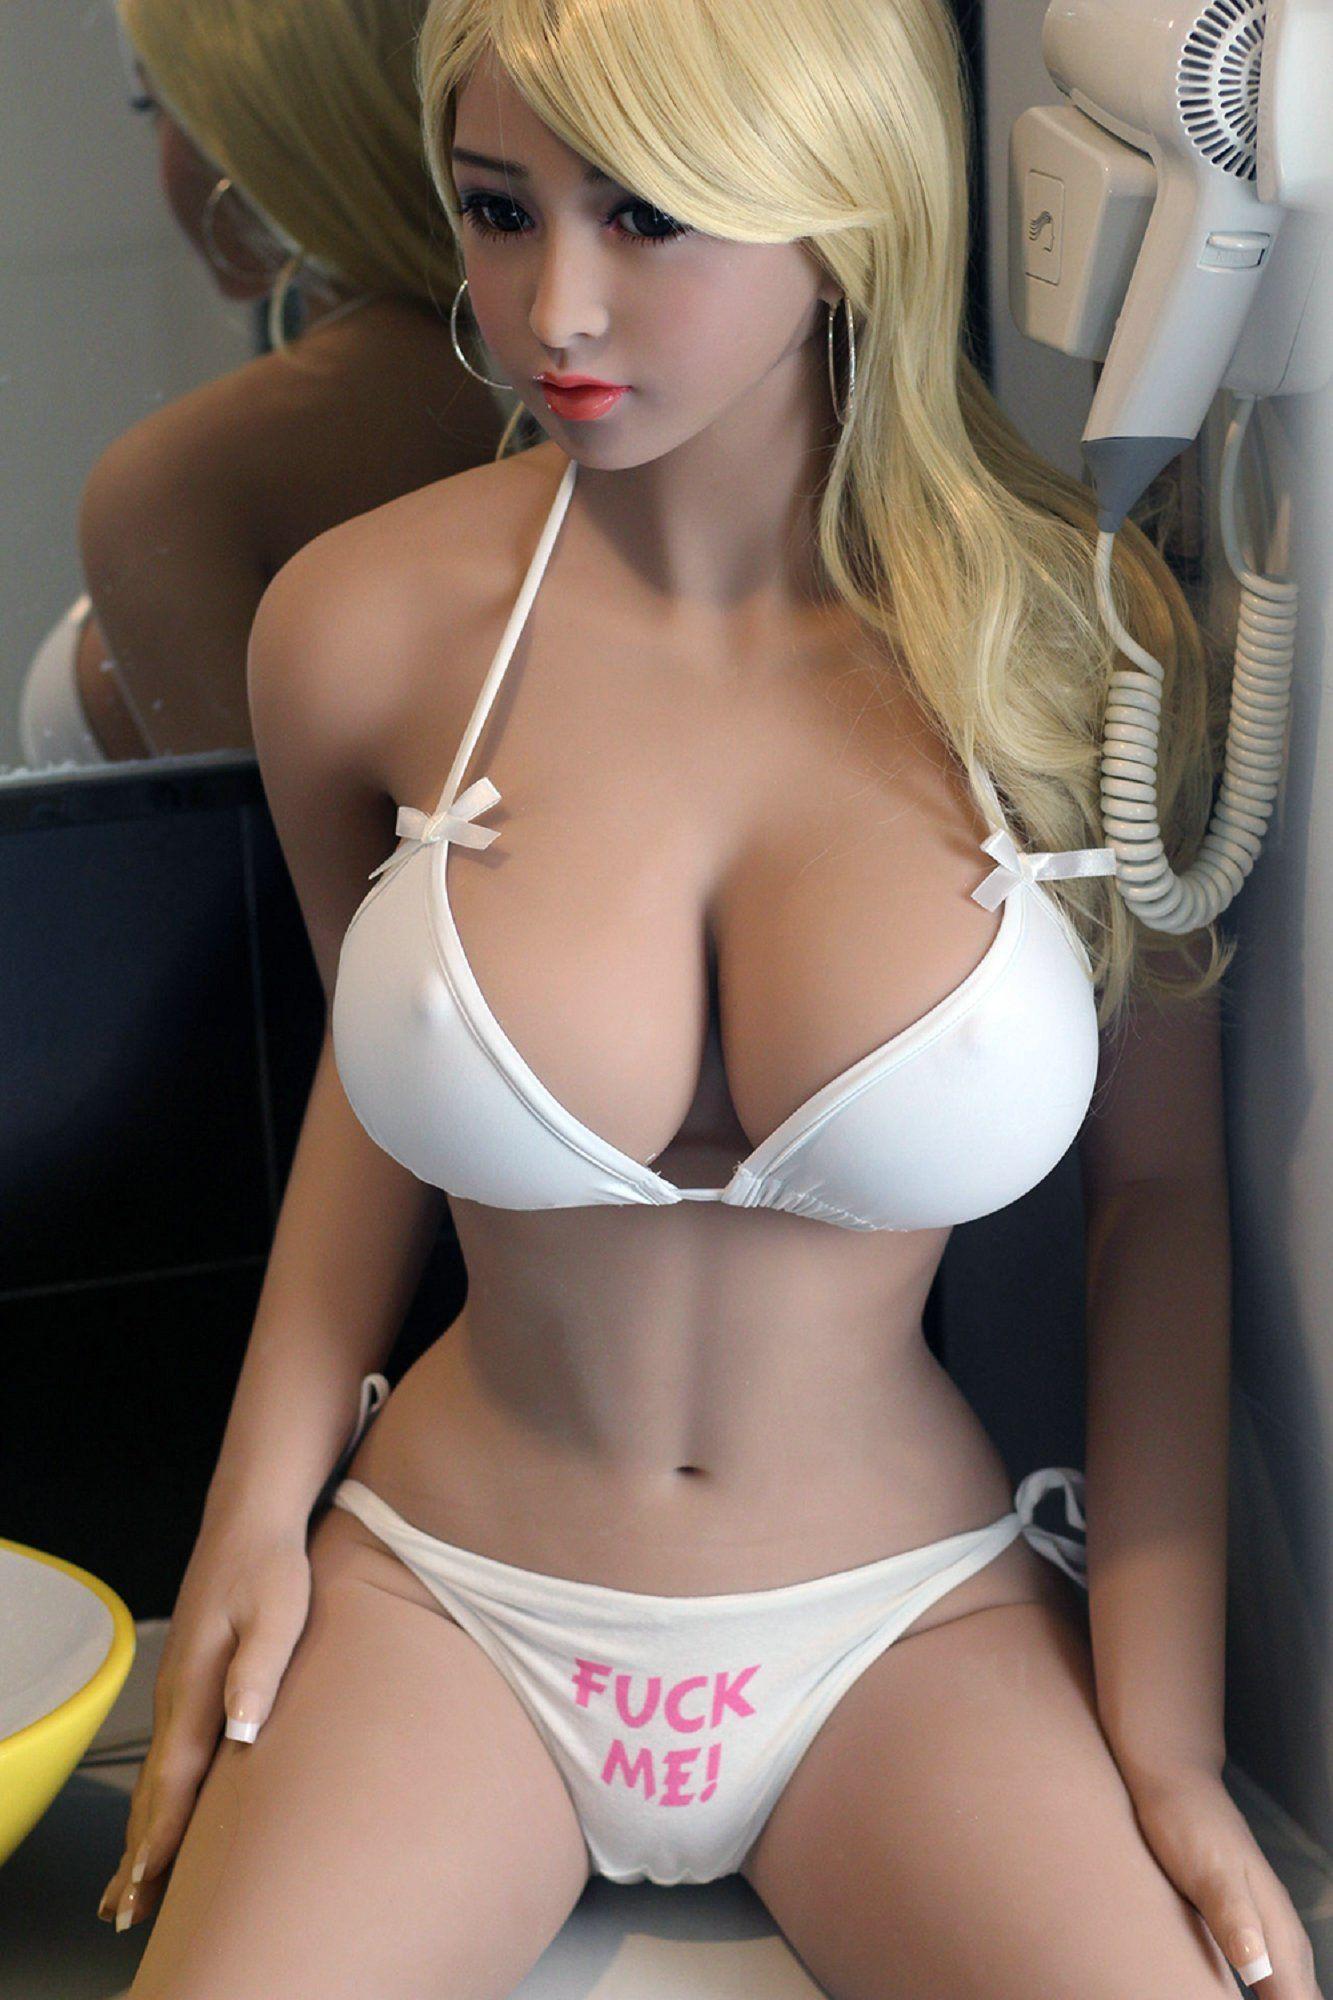 Sexy gifs amatuer desnudo